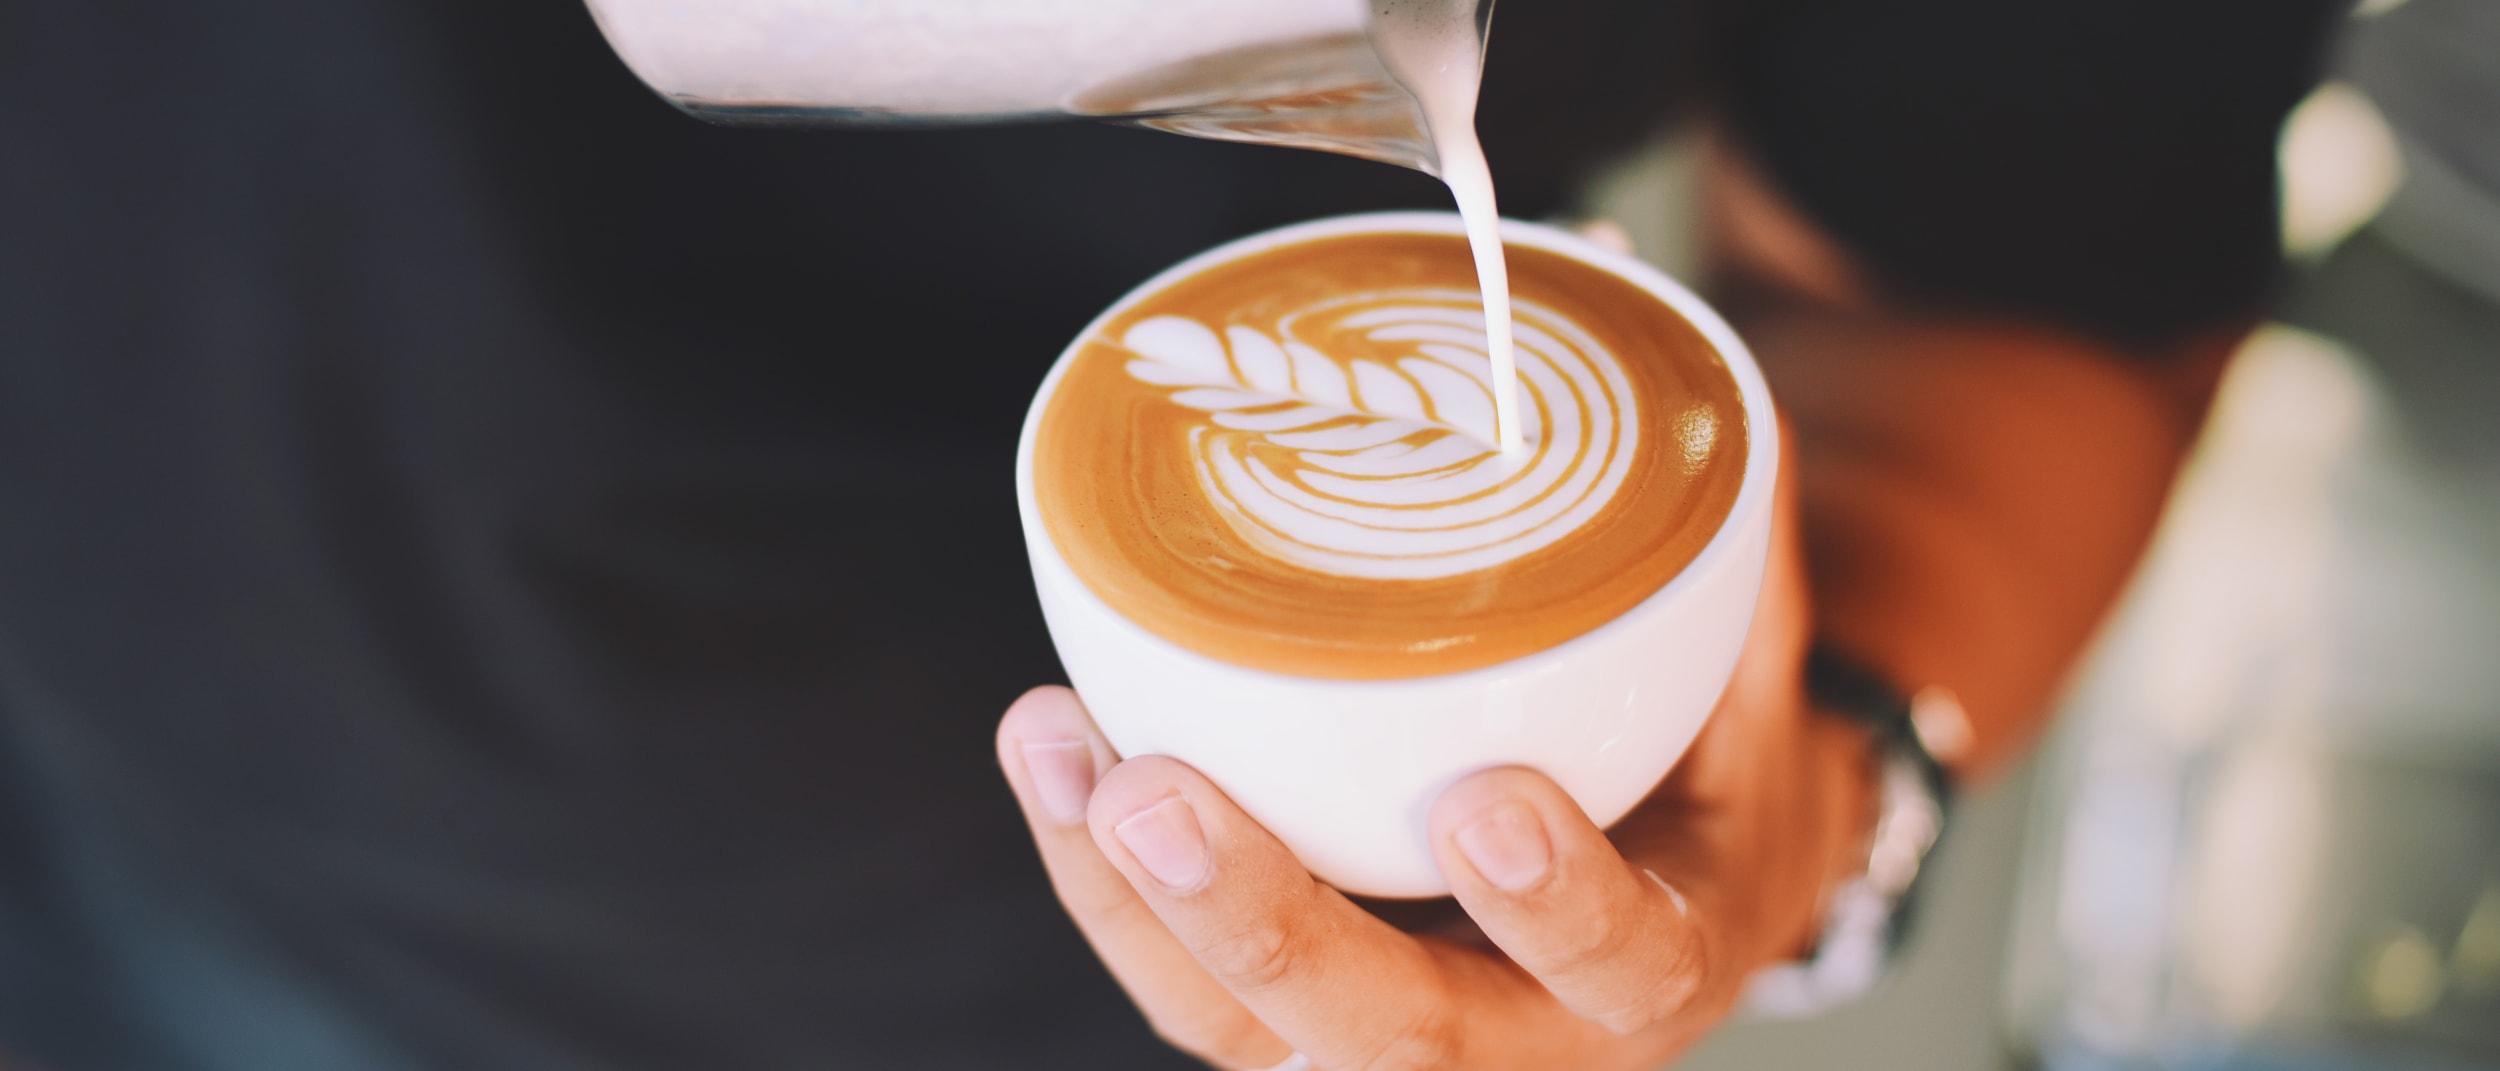 True brew -  Garden City's coffee highlights